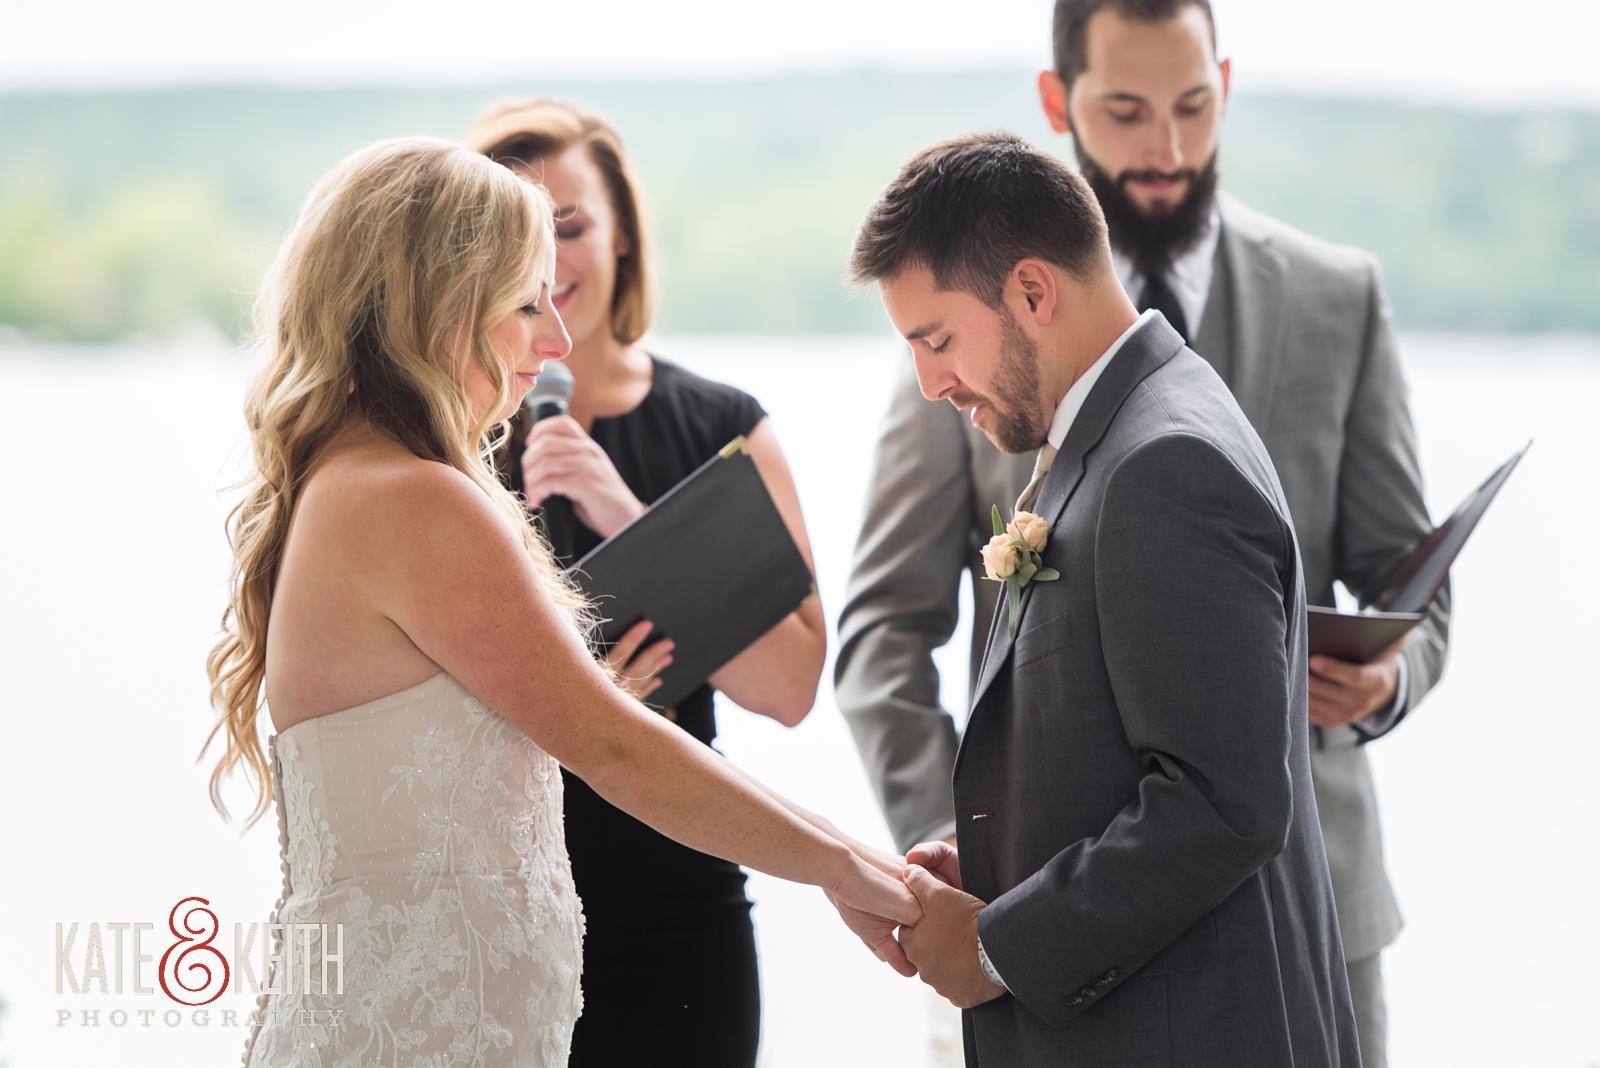 New Hampshire, Lakes Region, Lake Winnipesaukee, The Margate Resort, wedding, outdoor wedding, lakeside wedding, wedding ceremony, outdoor ceremony, tented ceremony, emotional moment